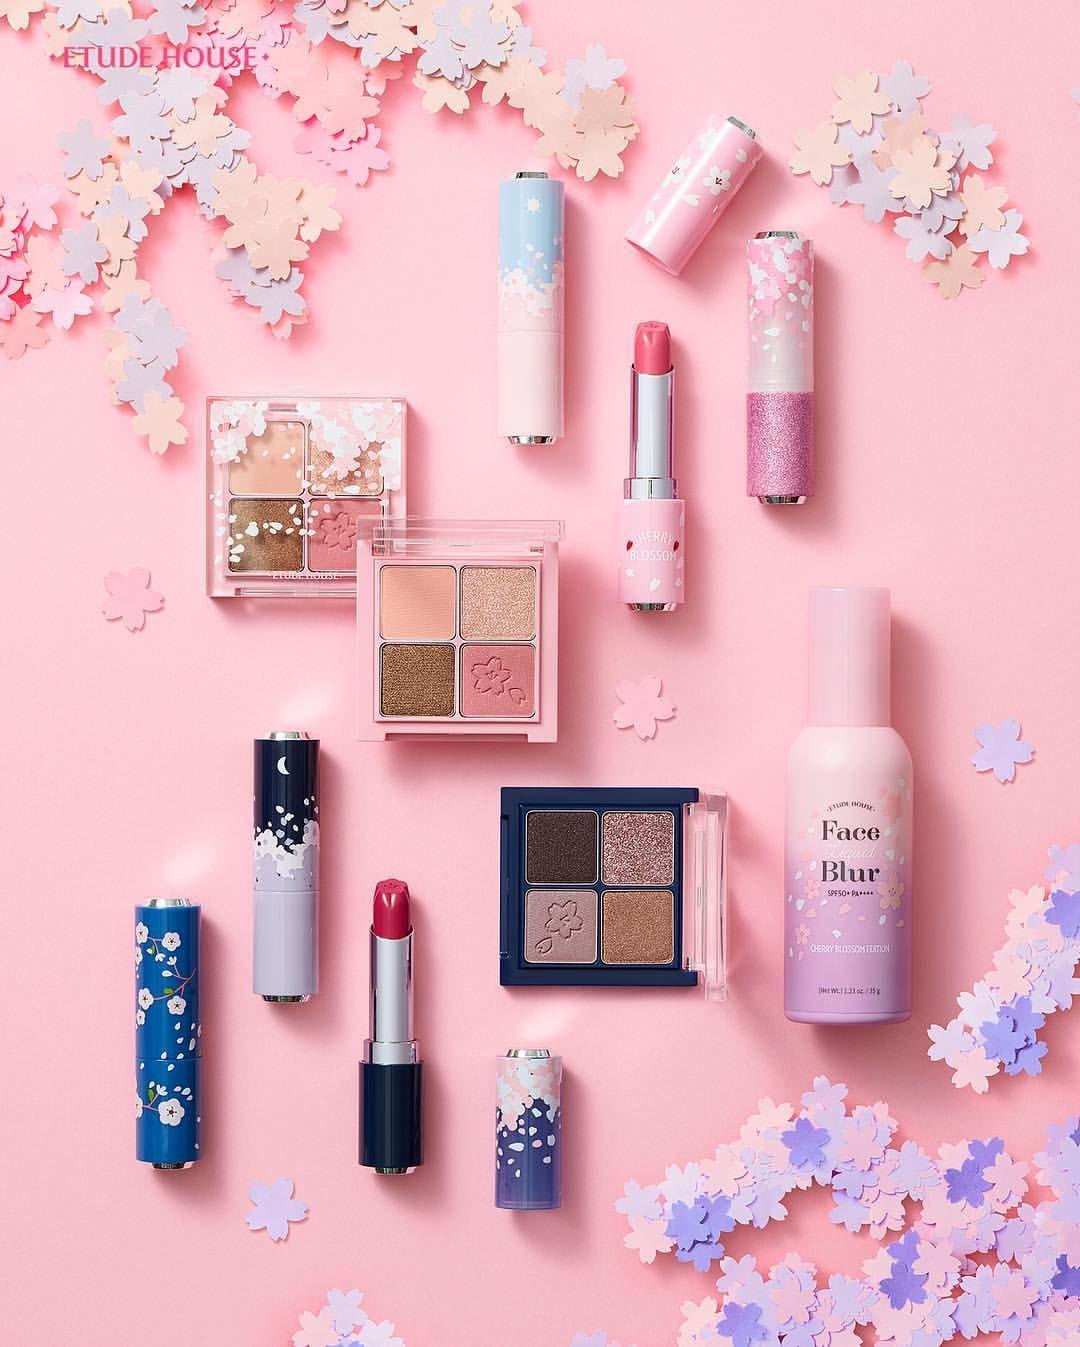 Etude House Spring Color & Mood 2018 NEW Cherry Blossom